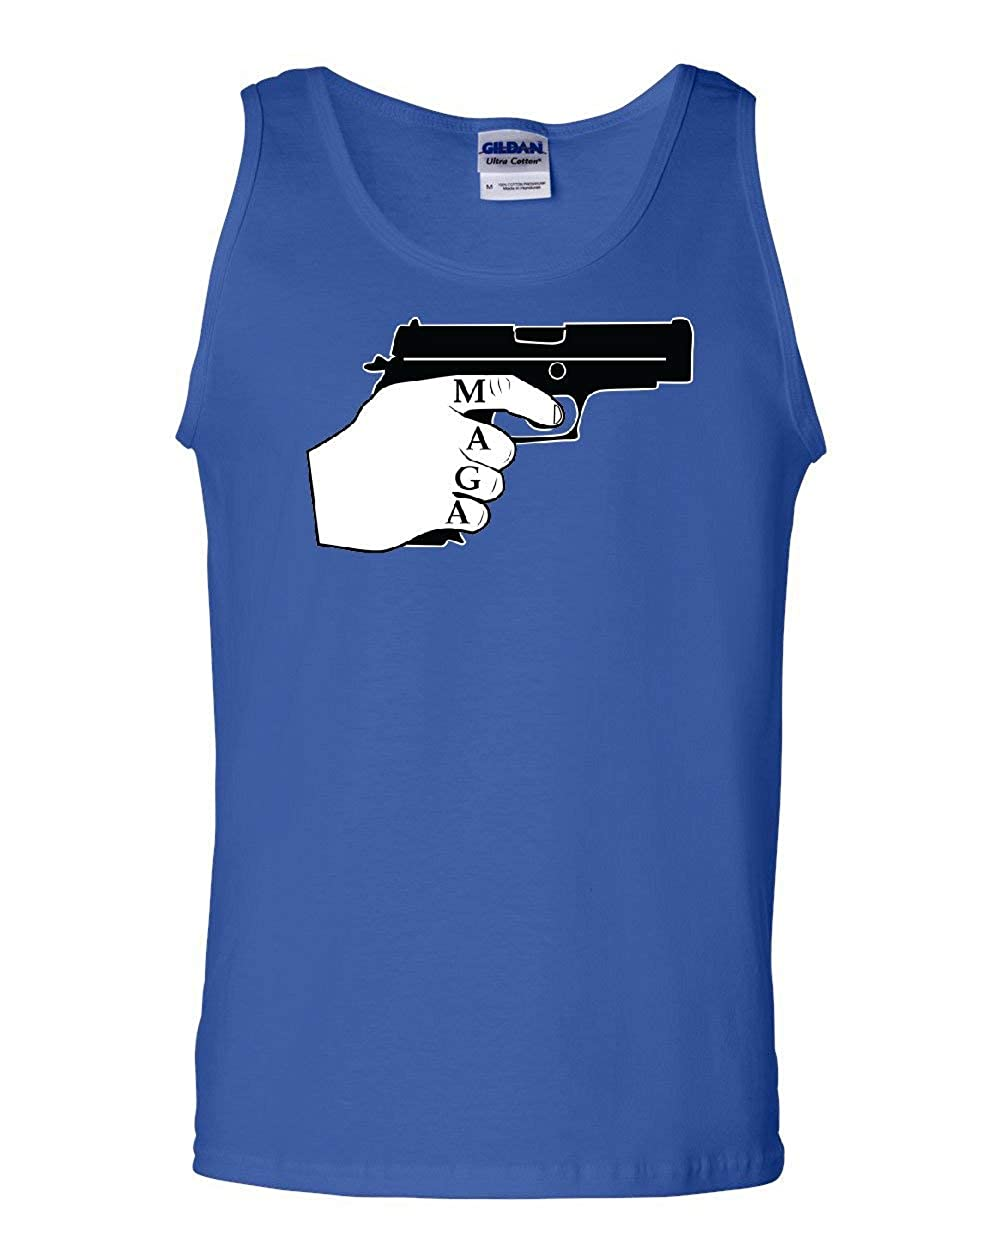 Tee Hunt MAGA Holding a Handgun Tank Top 2nd Amendment Keep America Great Sleeveless